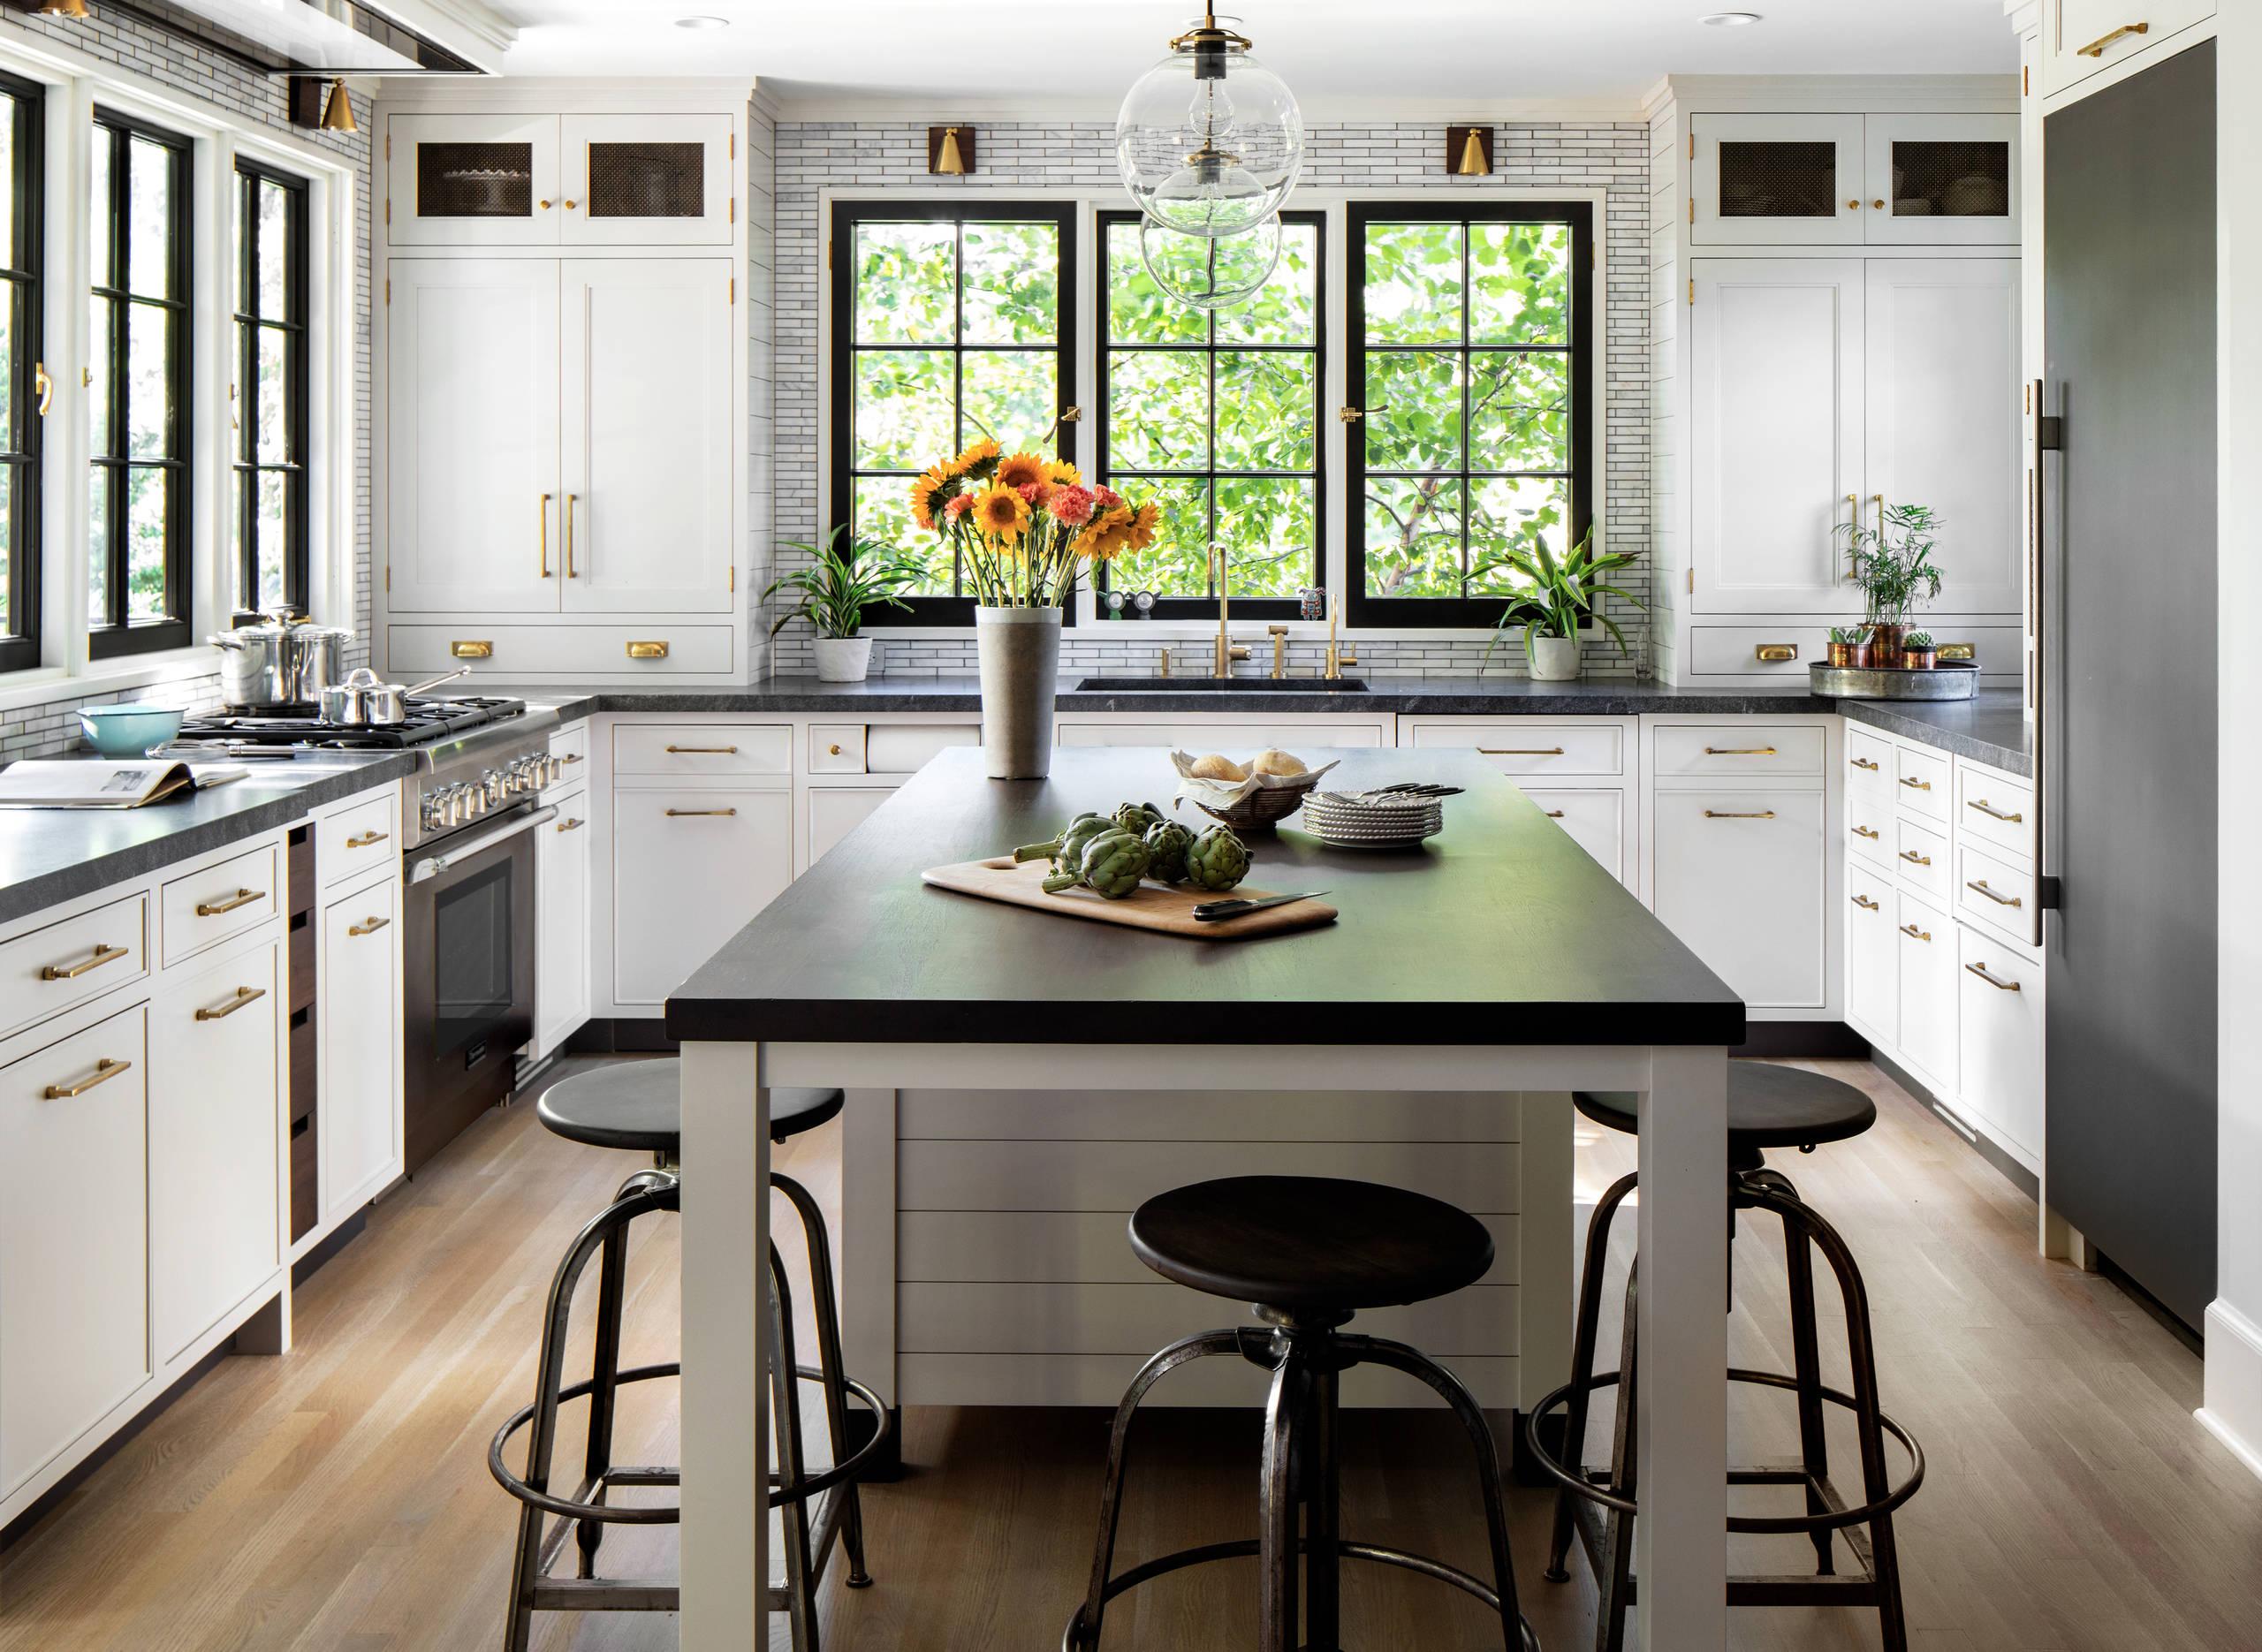 U Shaped Kitchen Designs Farmhouse Kitchen Aqua Grantique Black Granite Ashley Norton Hardware Buffalo Check Counter Stools Circa Lighting Darlana Lantern Classic Design